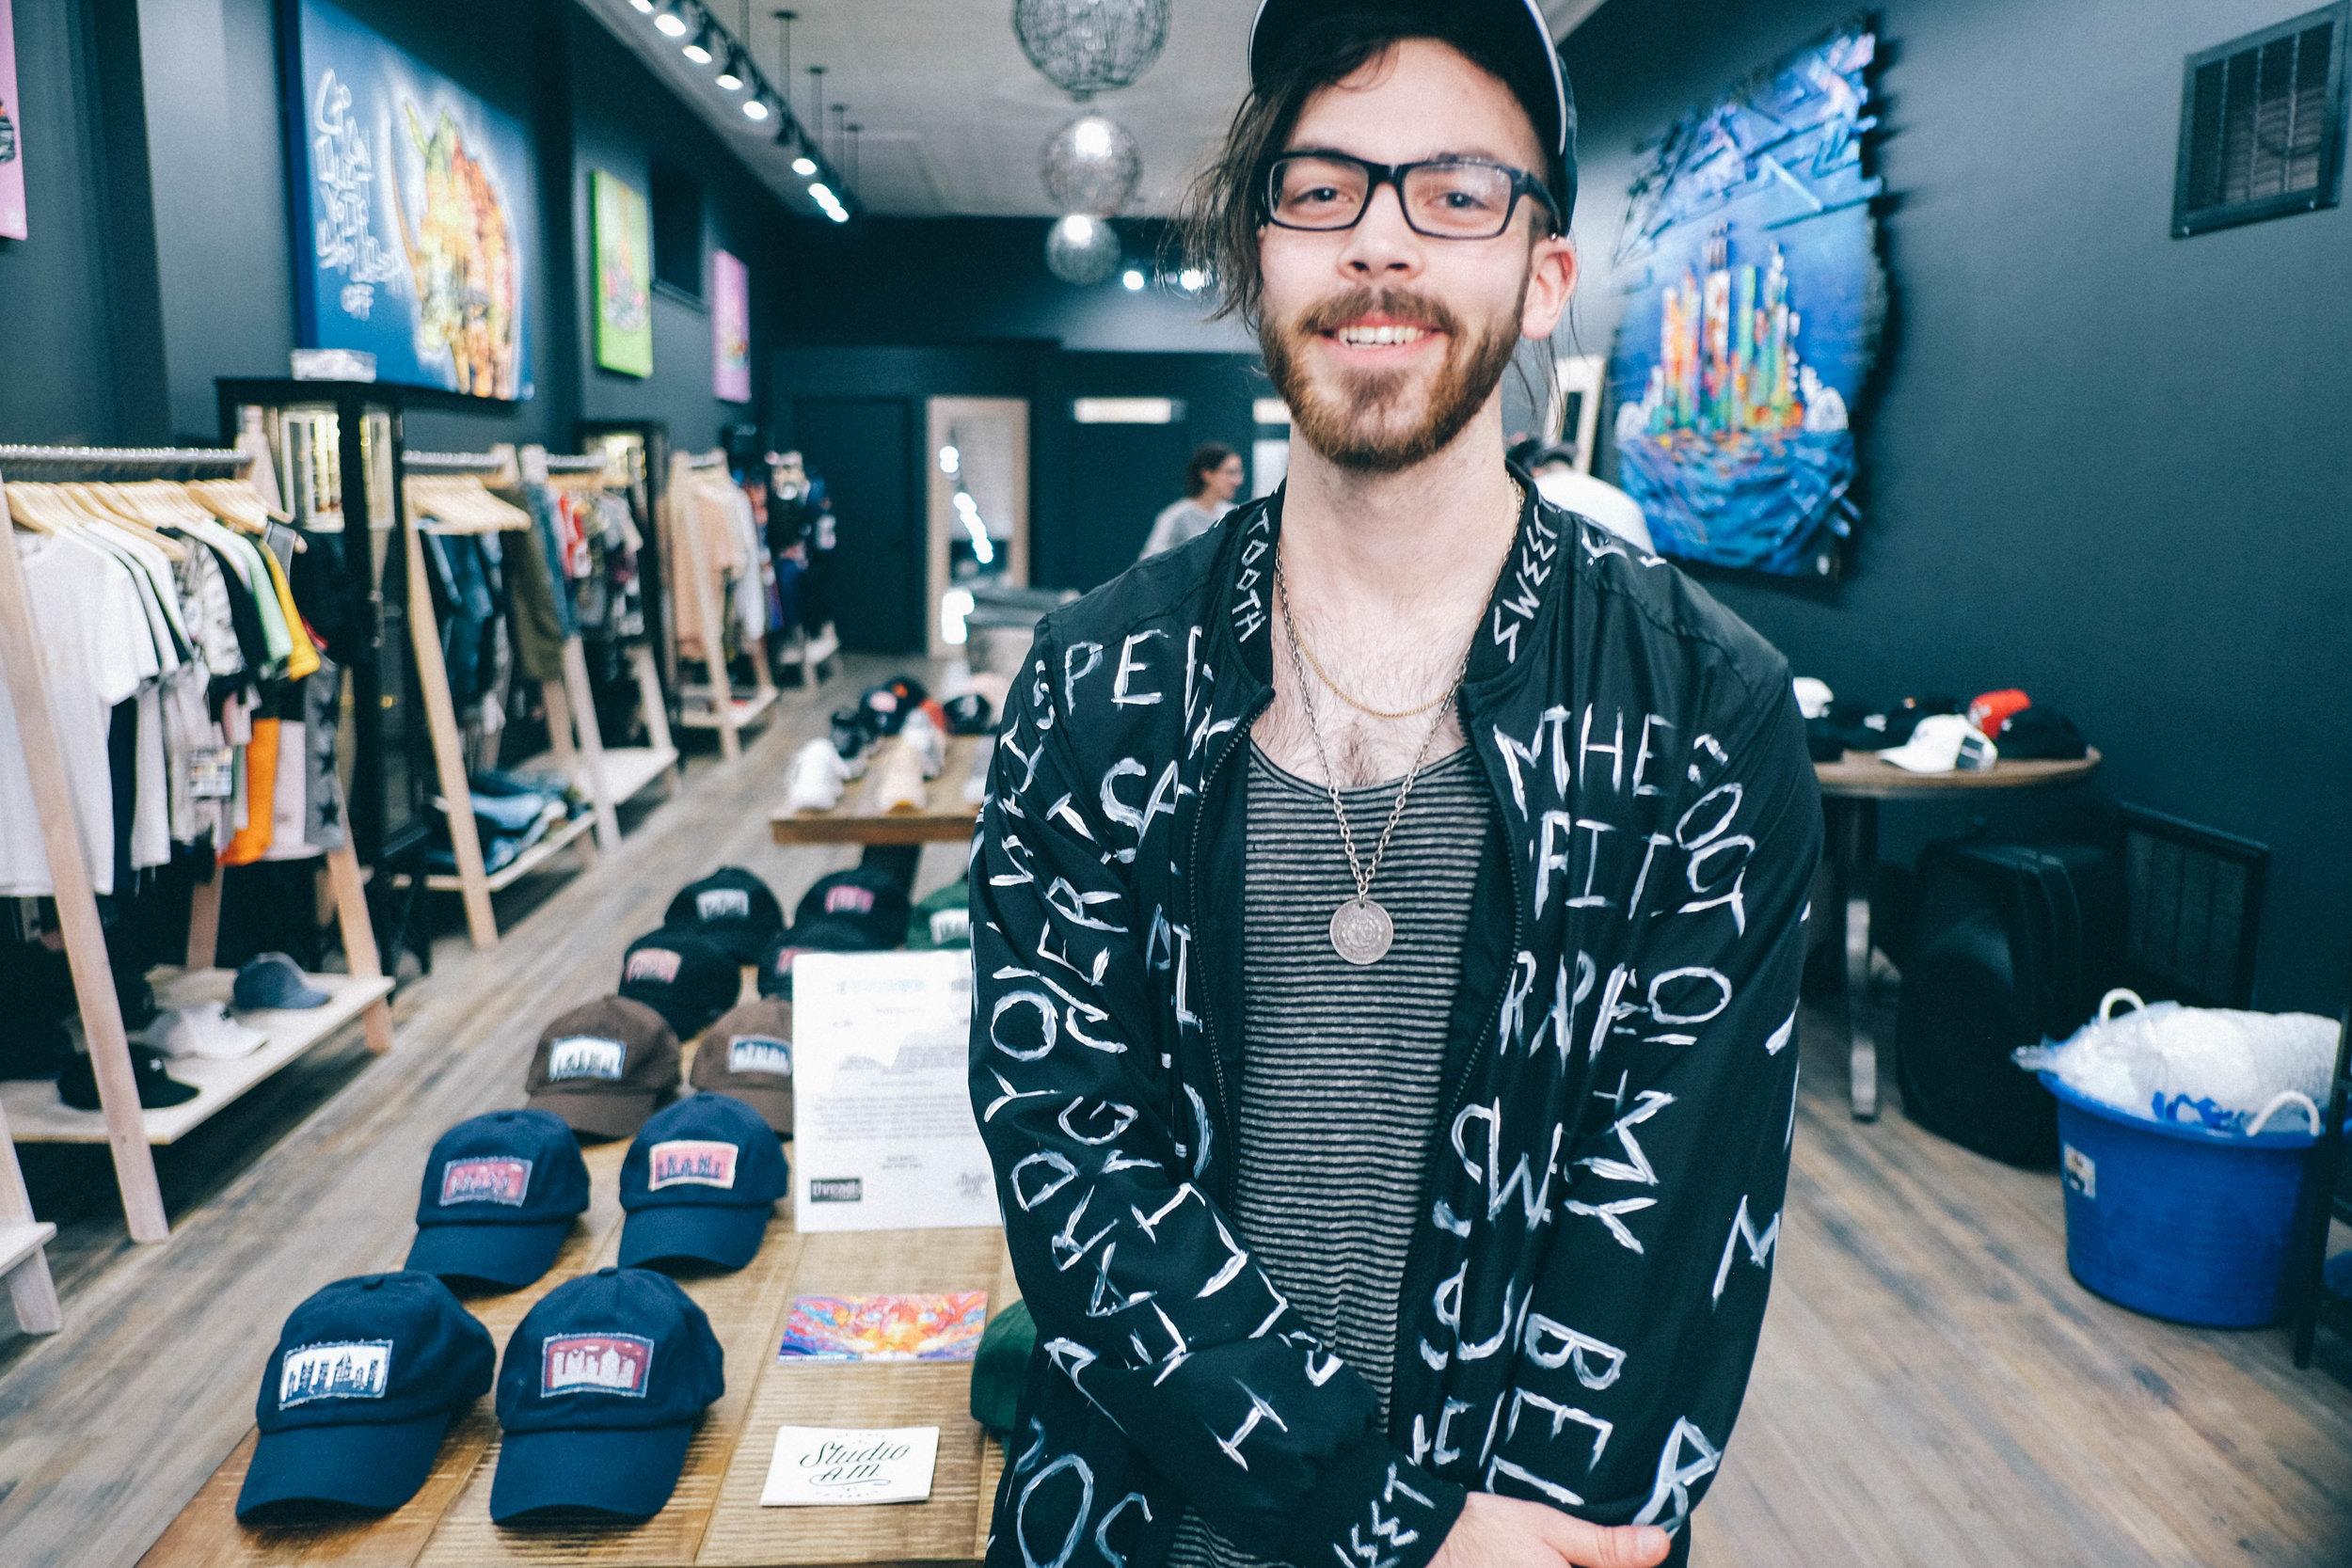 Nick Seyler - This photo from album drop at Threads on Carson.IG: @nickseyler